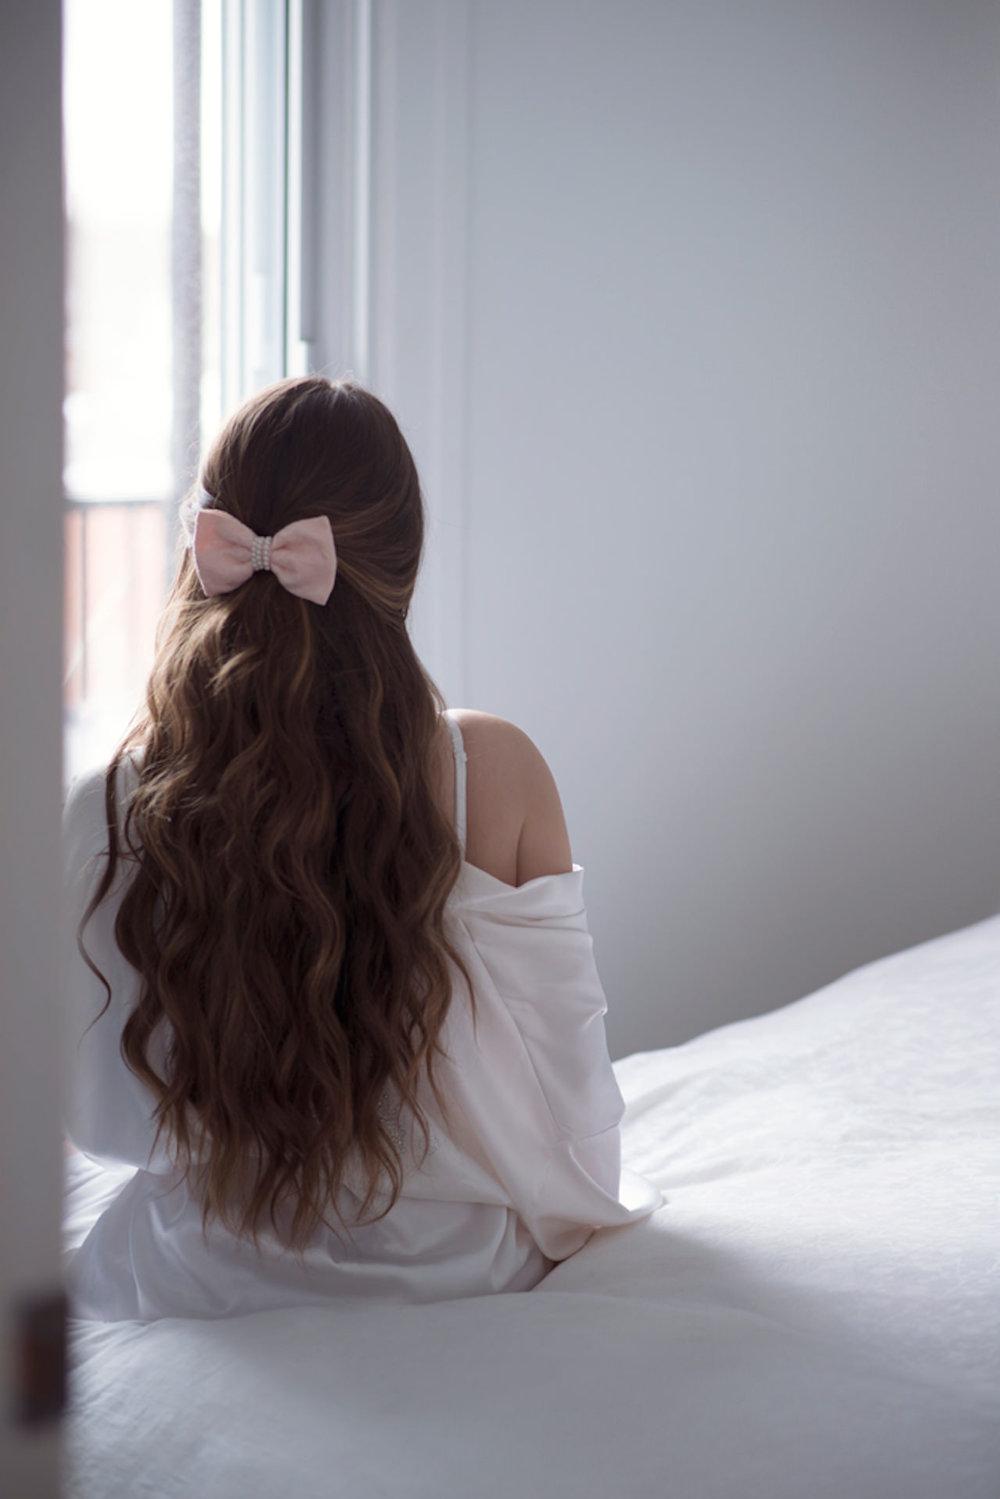 Marie-Eve_morin_03_mini.jpg